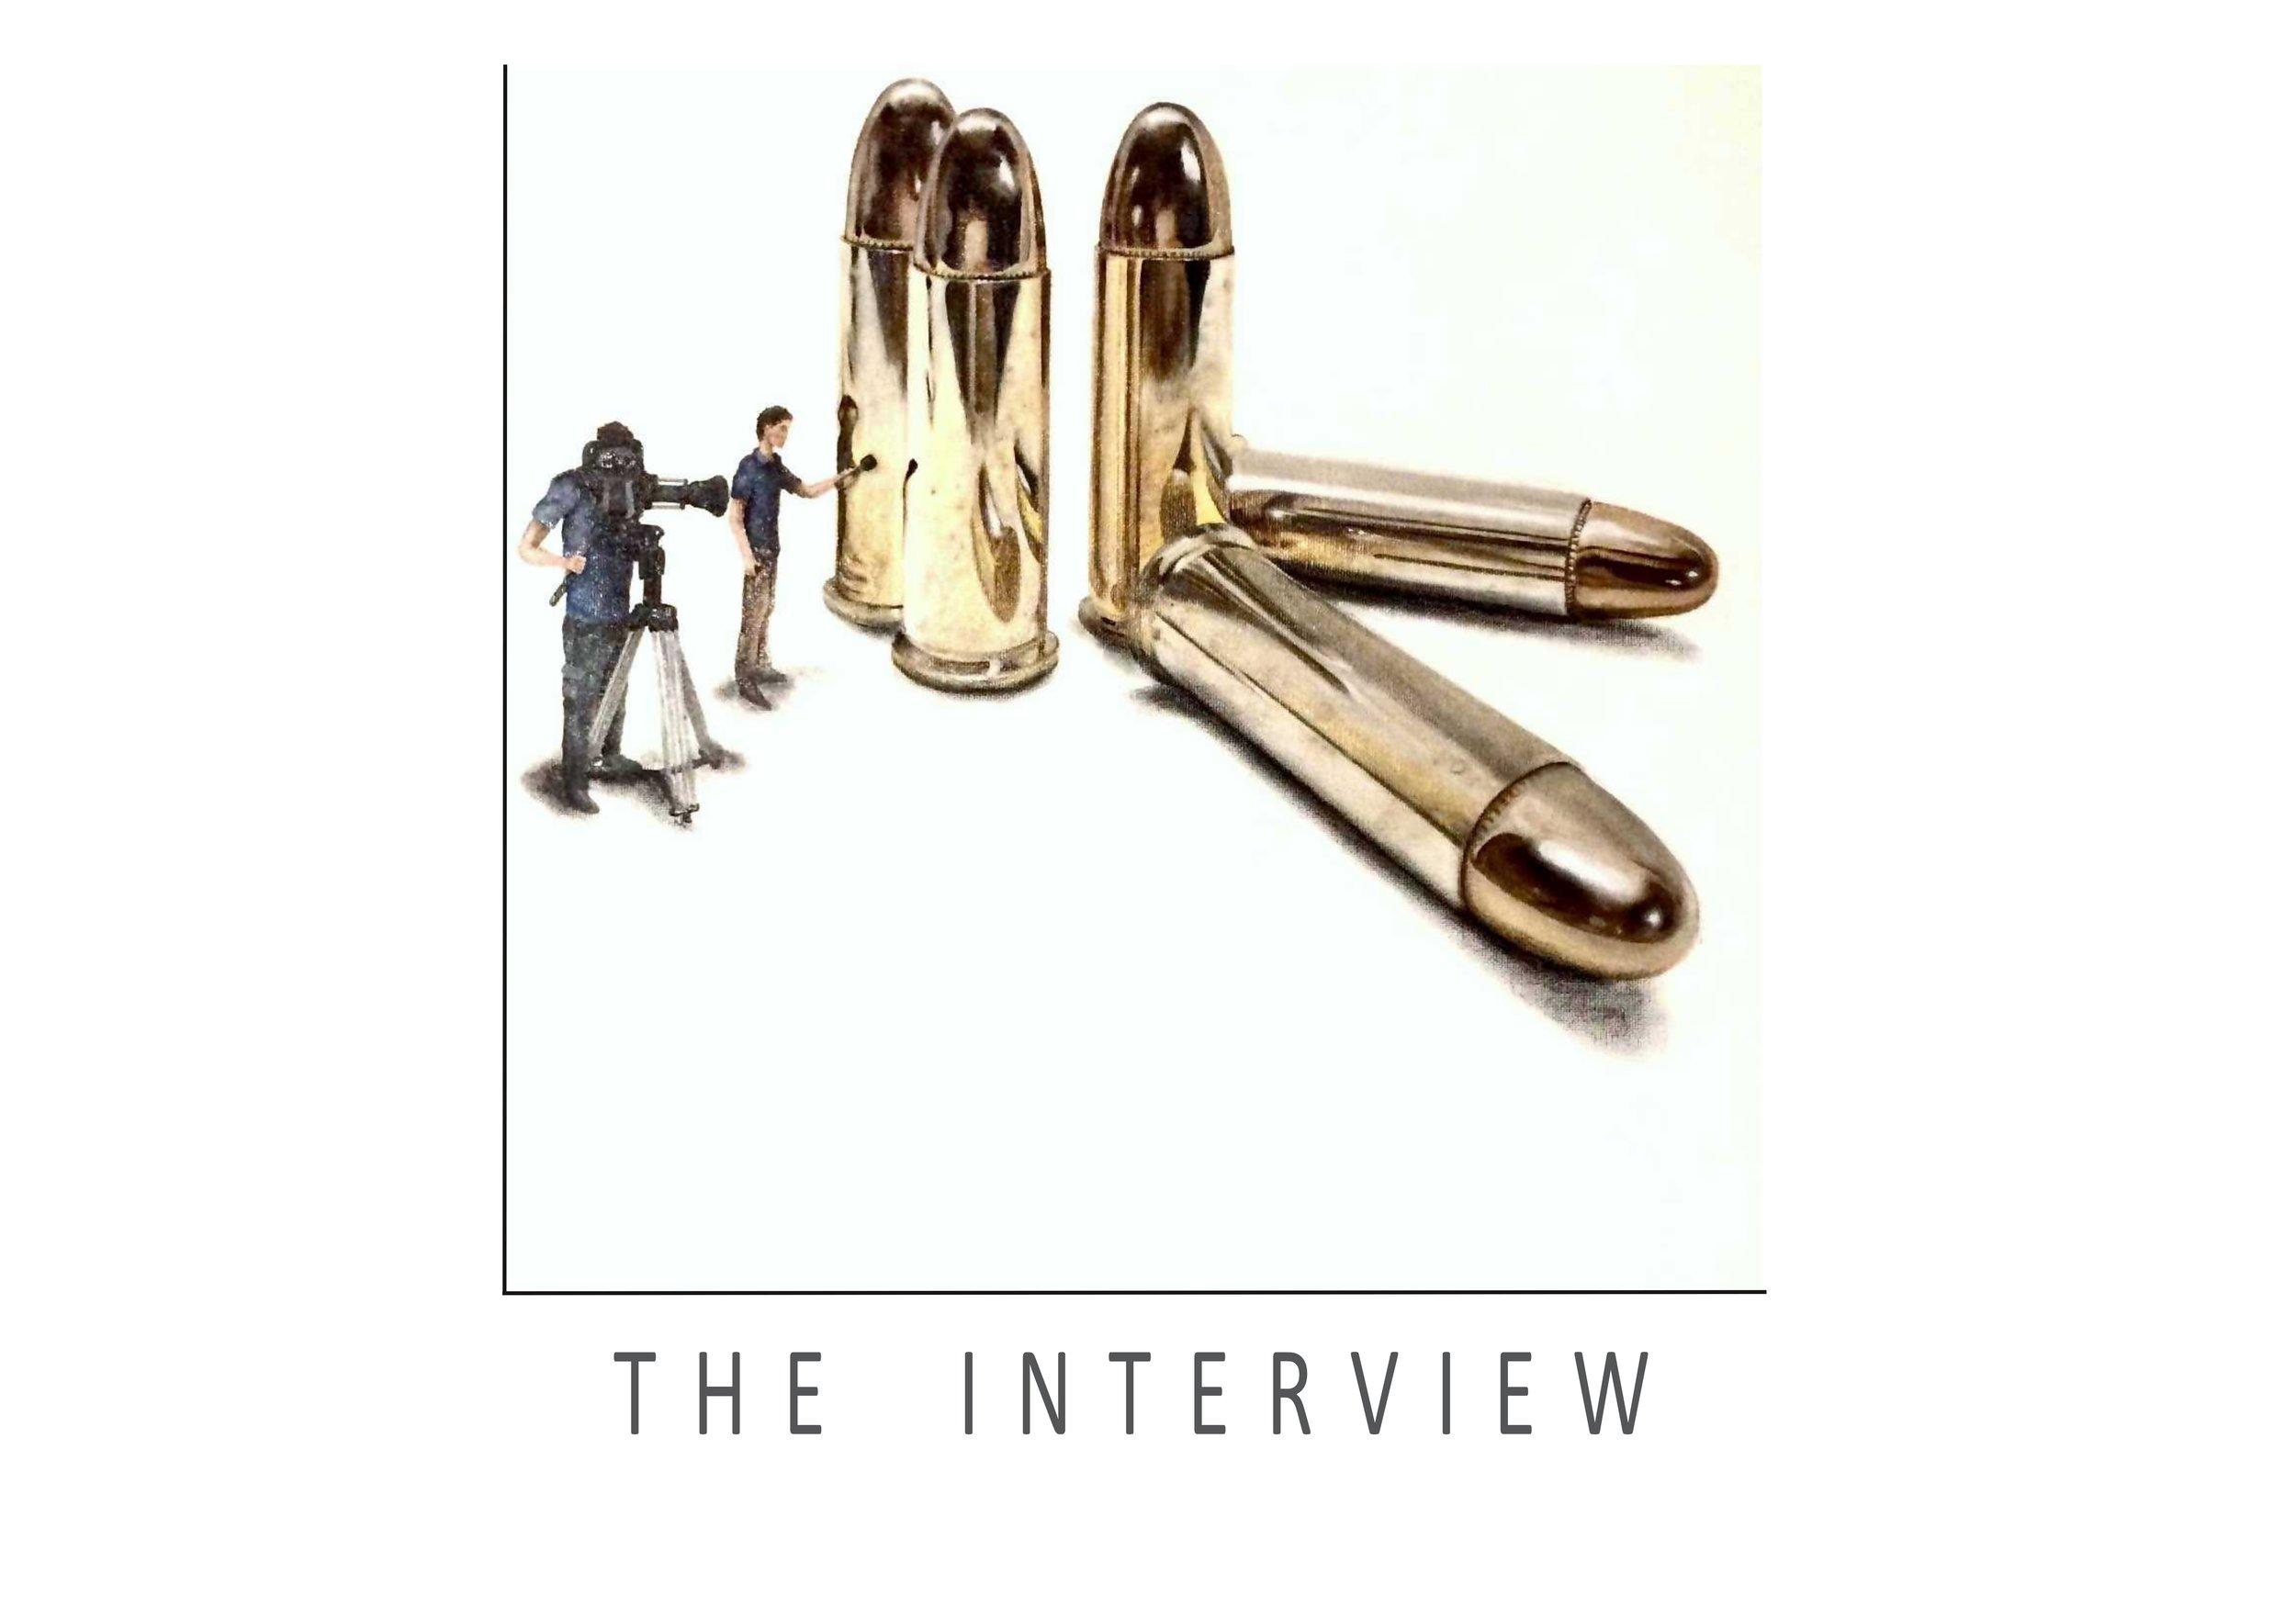 THE INTERVIEW1-Pagina001.jpeg